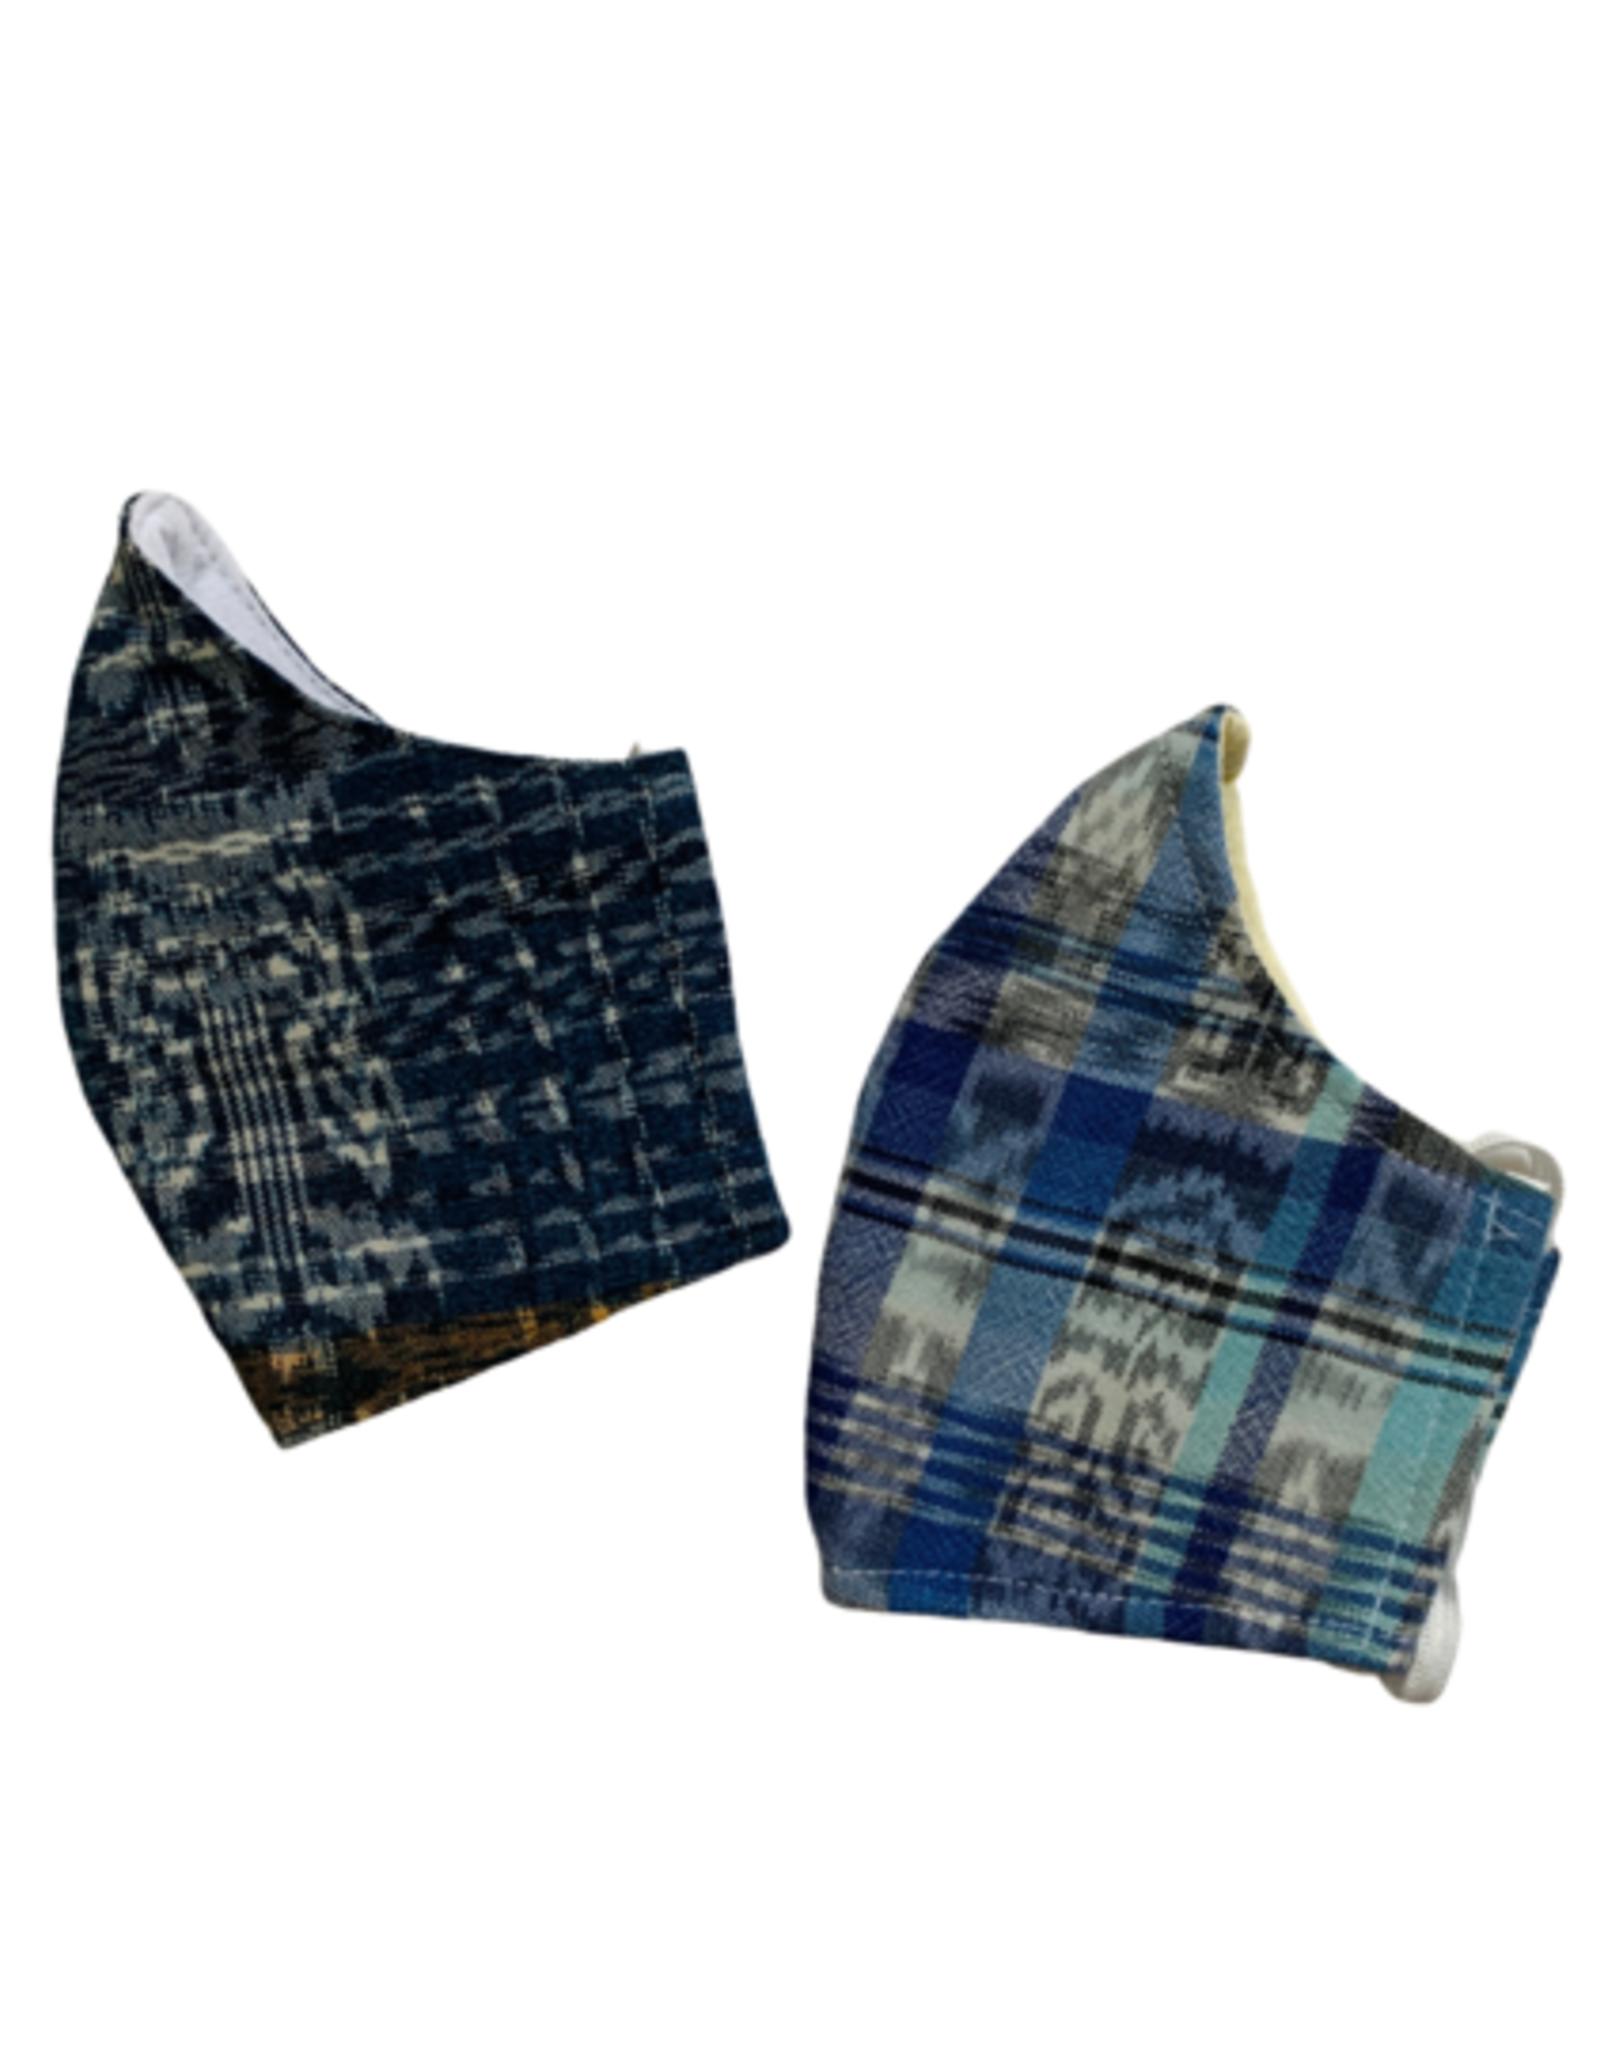 Corte Mask w/ Pocket, Adult, Blue Tones, Guatemala